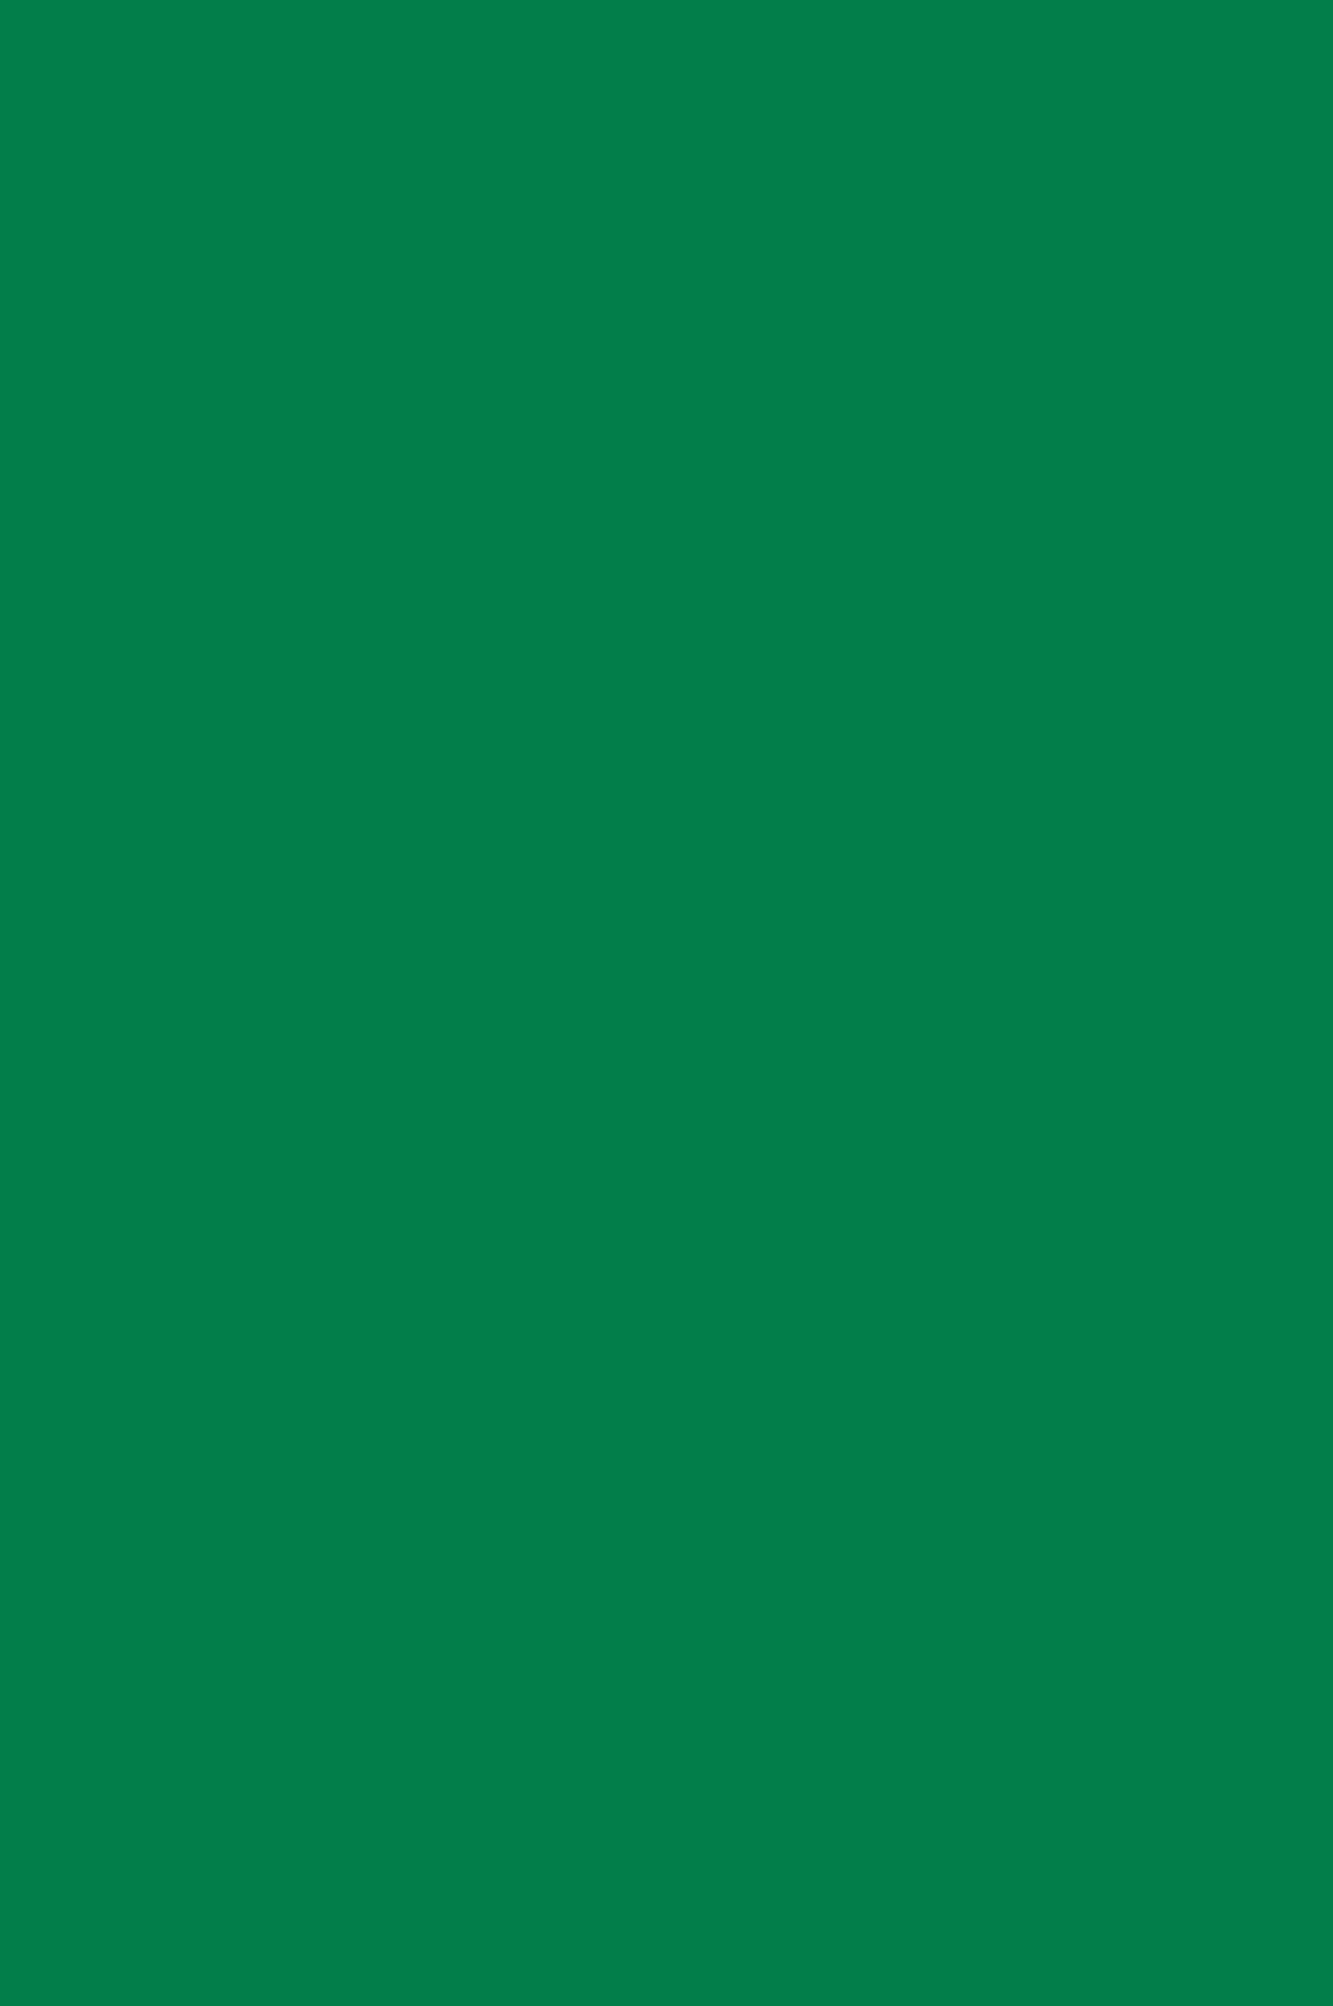 3020 HG Зеленый